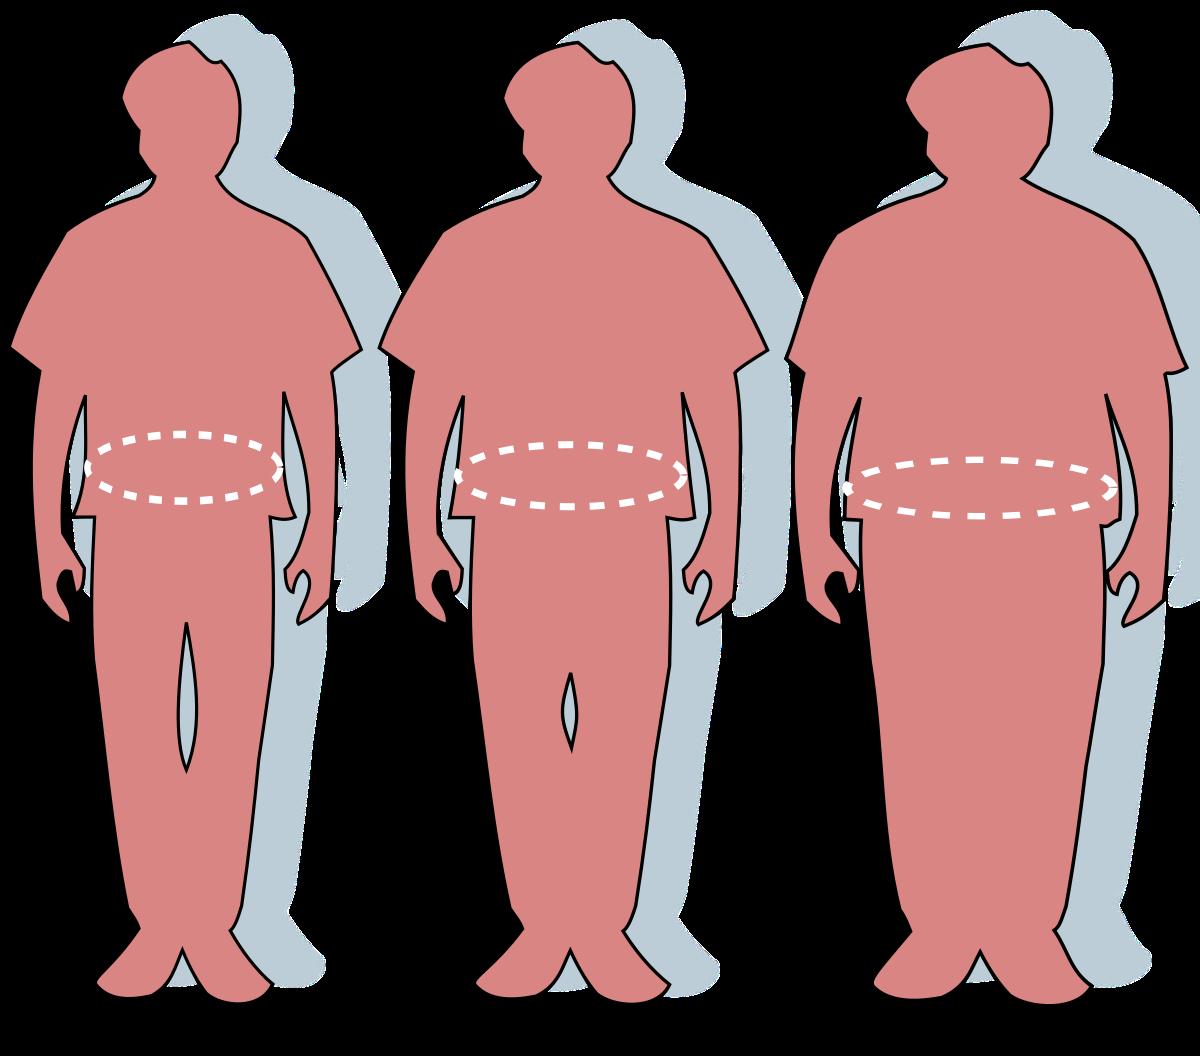 75 kg pierd in greutate